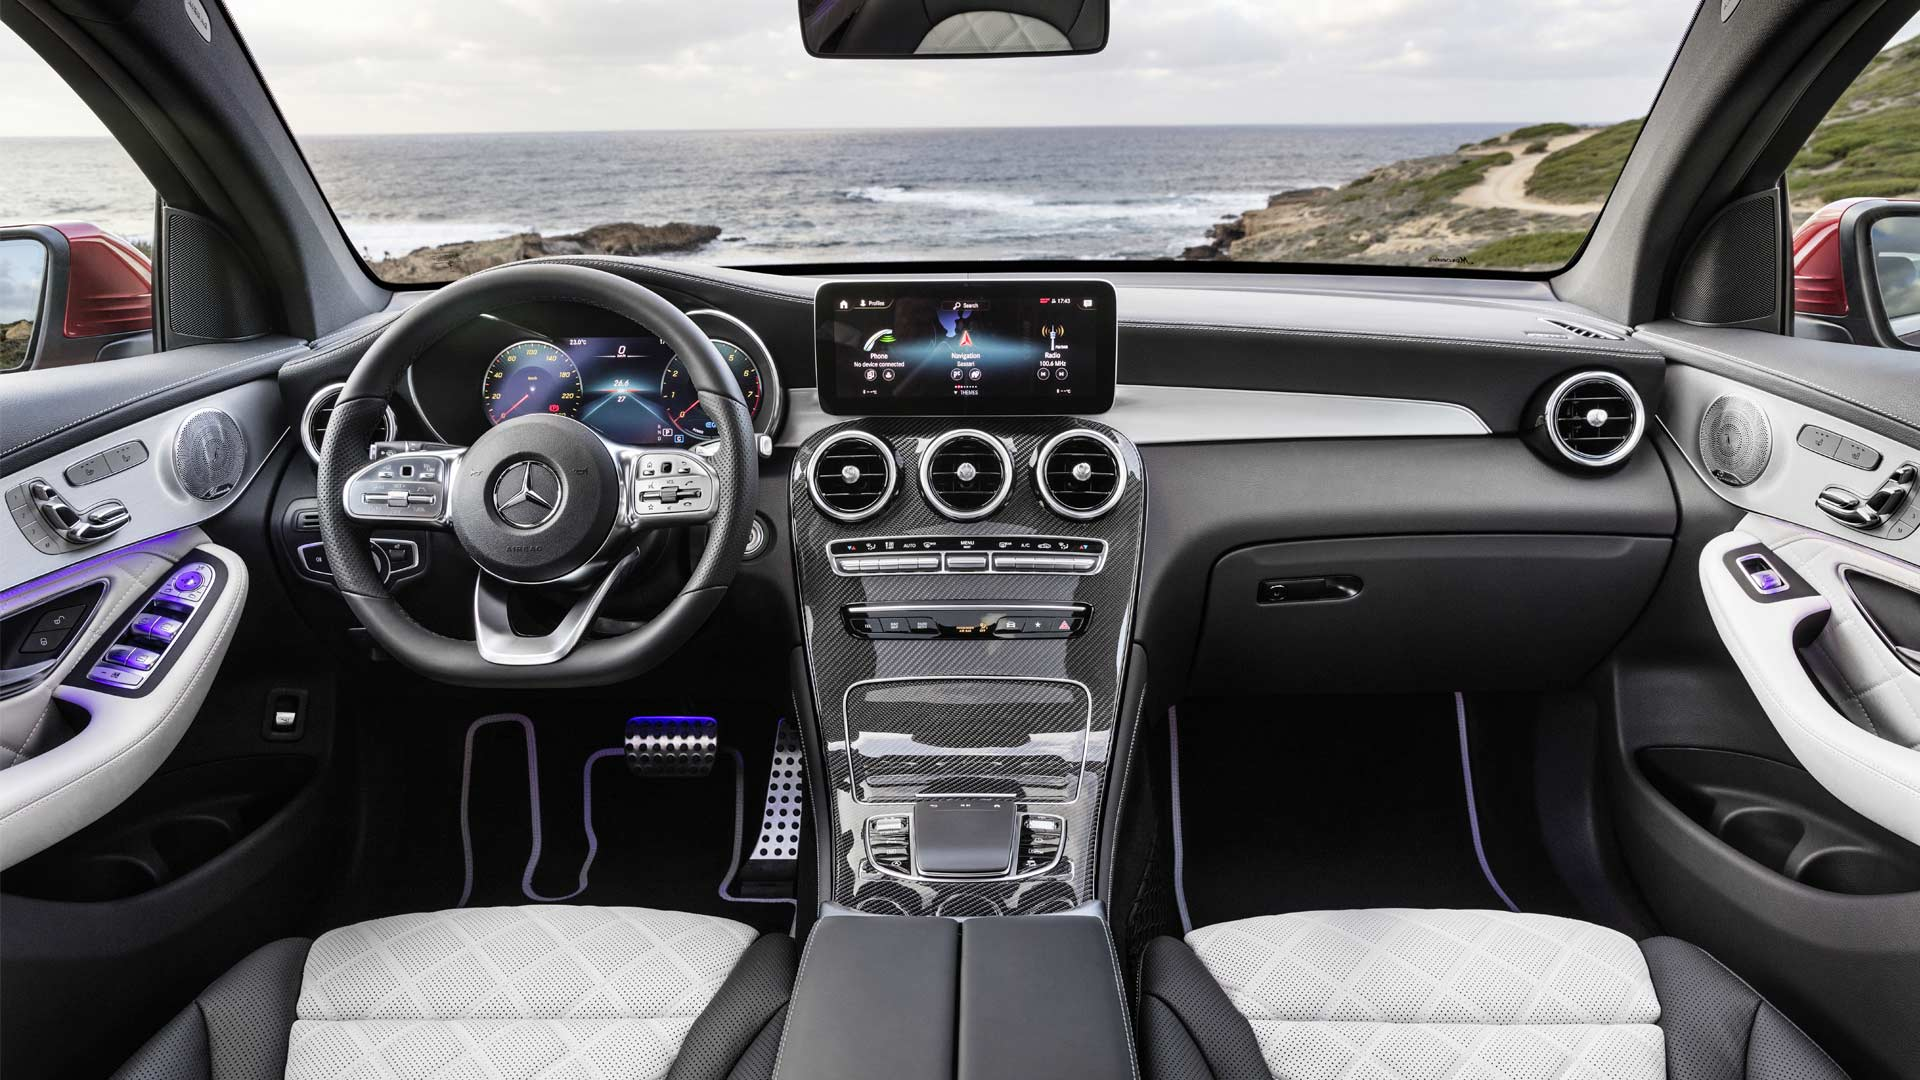 2020-Mercedes-Benz-GLC-Coupé-Interior_2